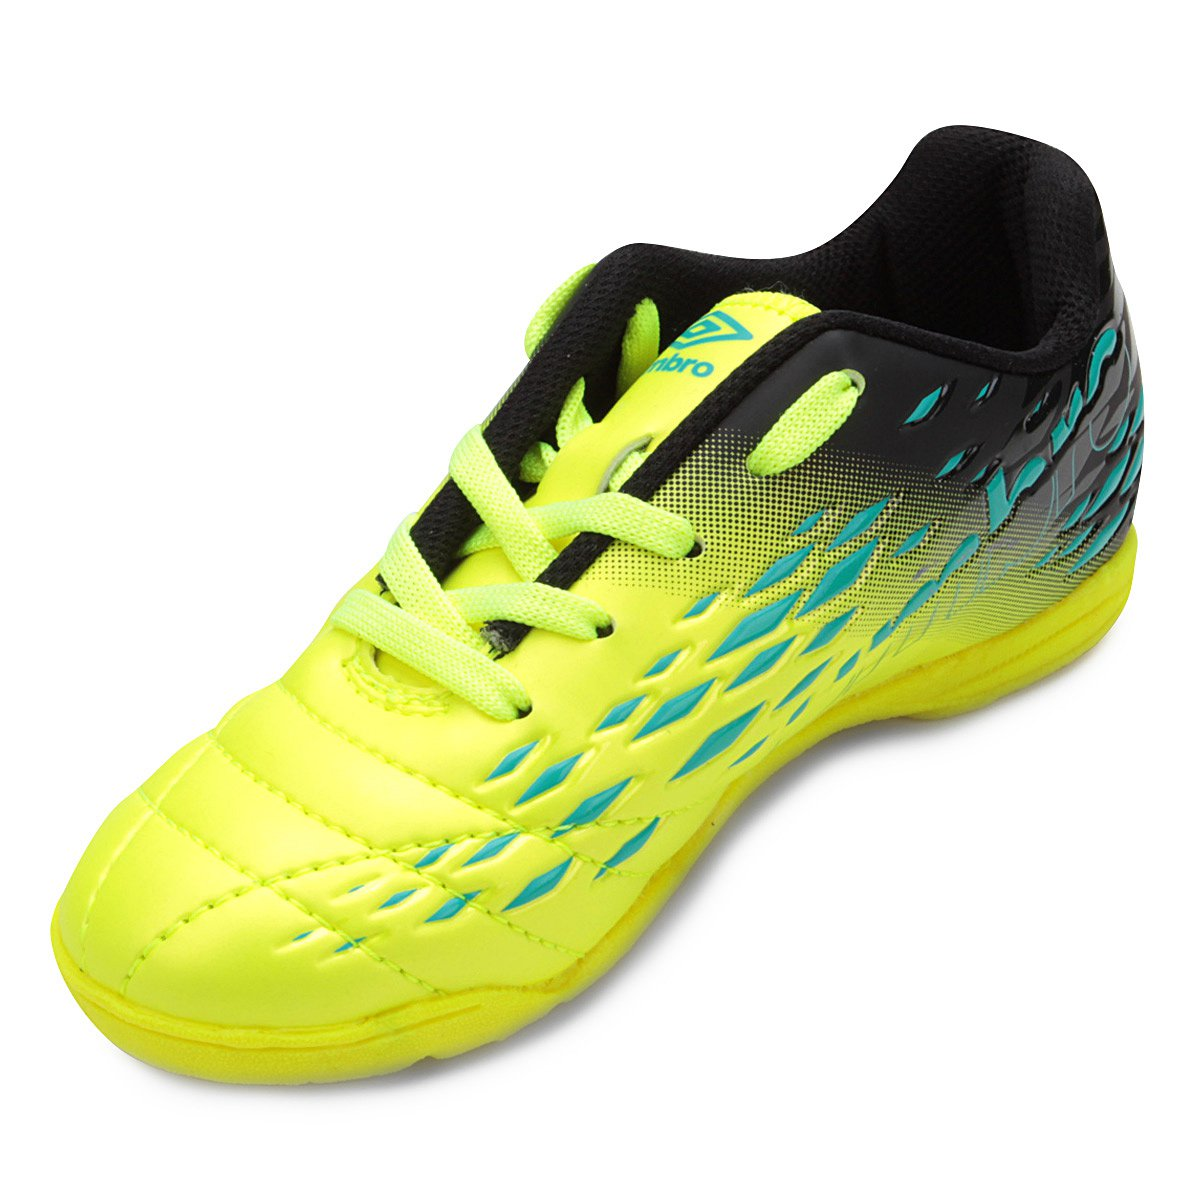 ea314a7099 Chuteira Futsal Infantil Umbro Fifty II - Verde e Azul - Compre ...